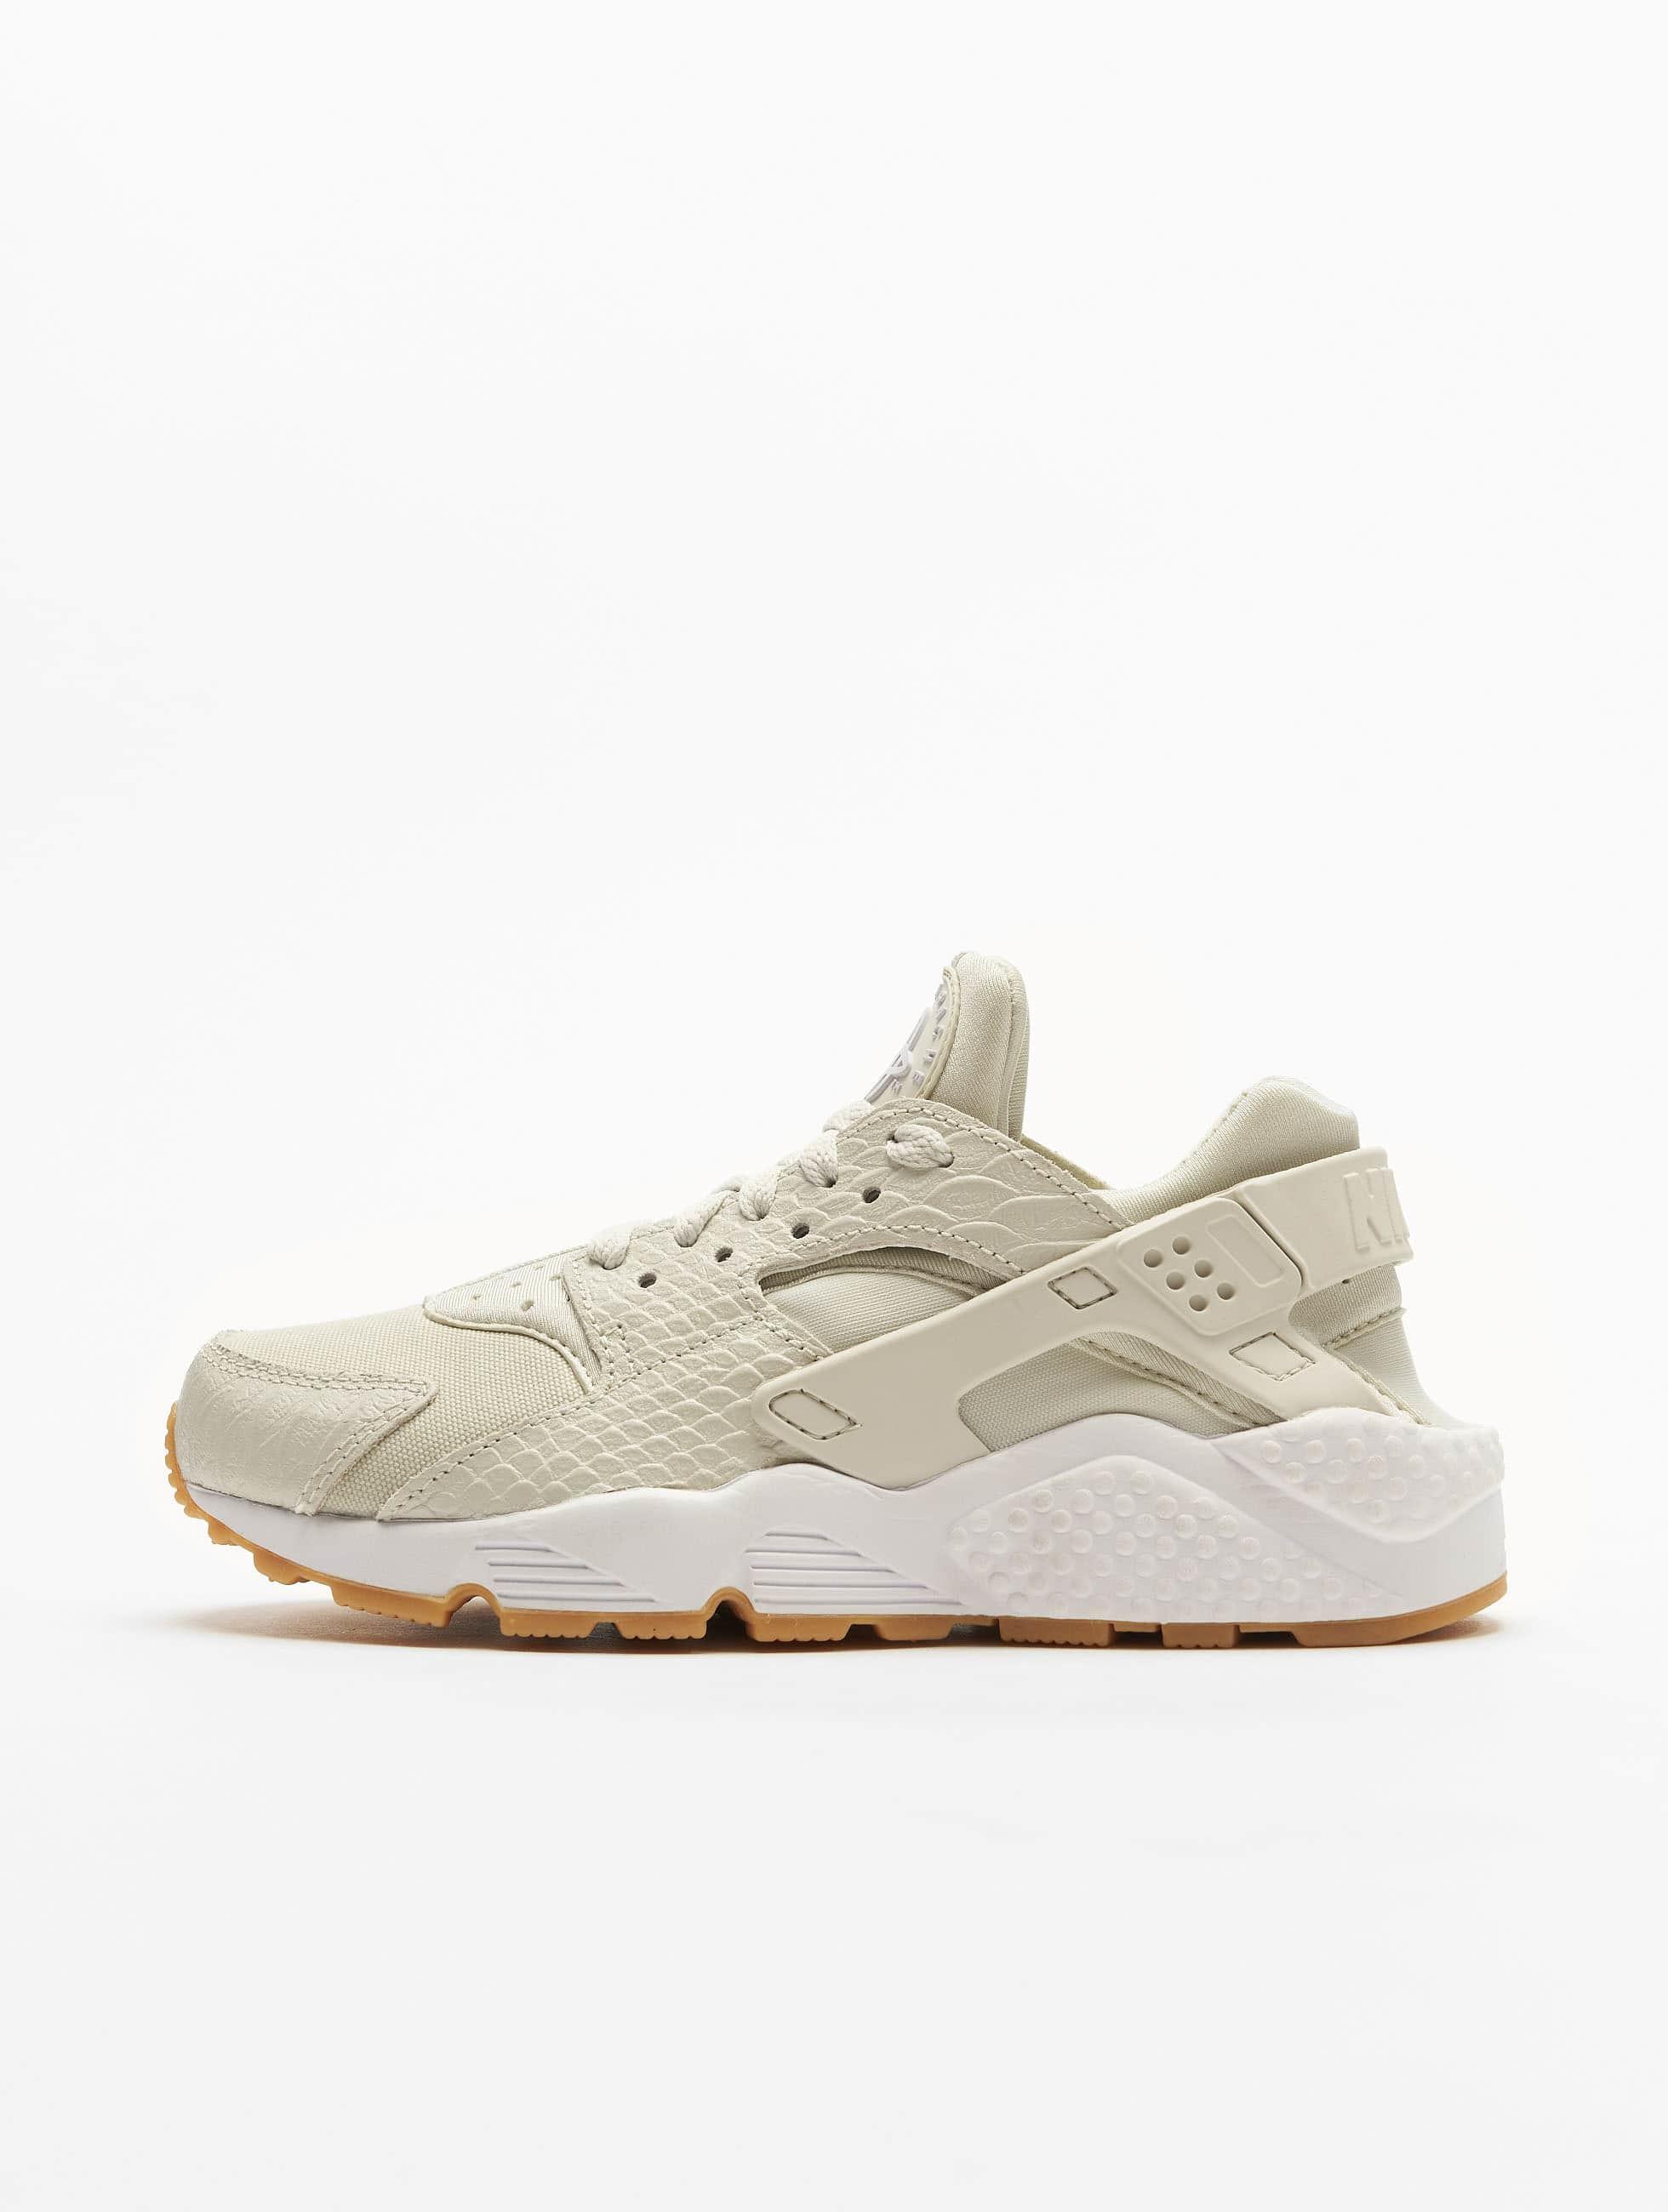 Nike Air Huarache Run Se Sneakers Beige